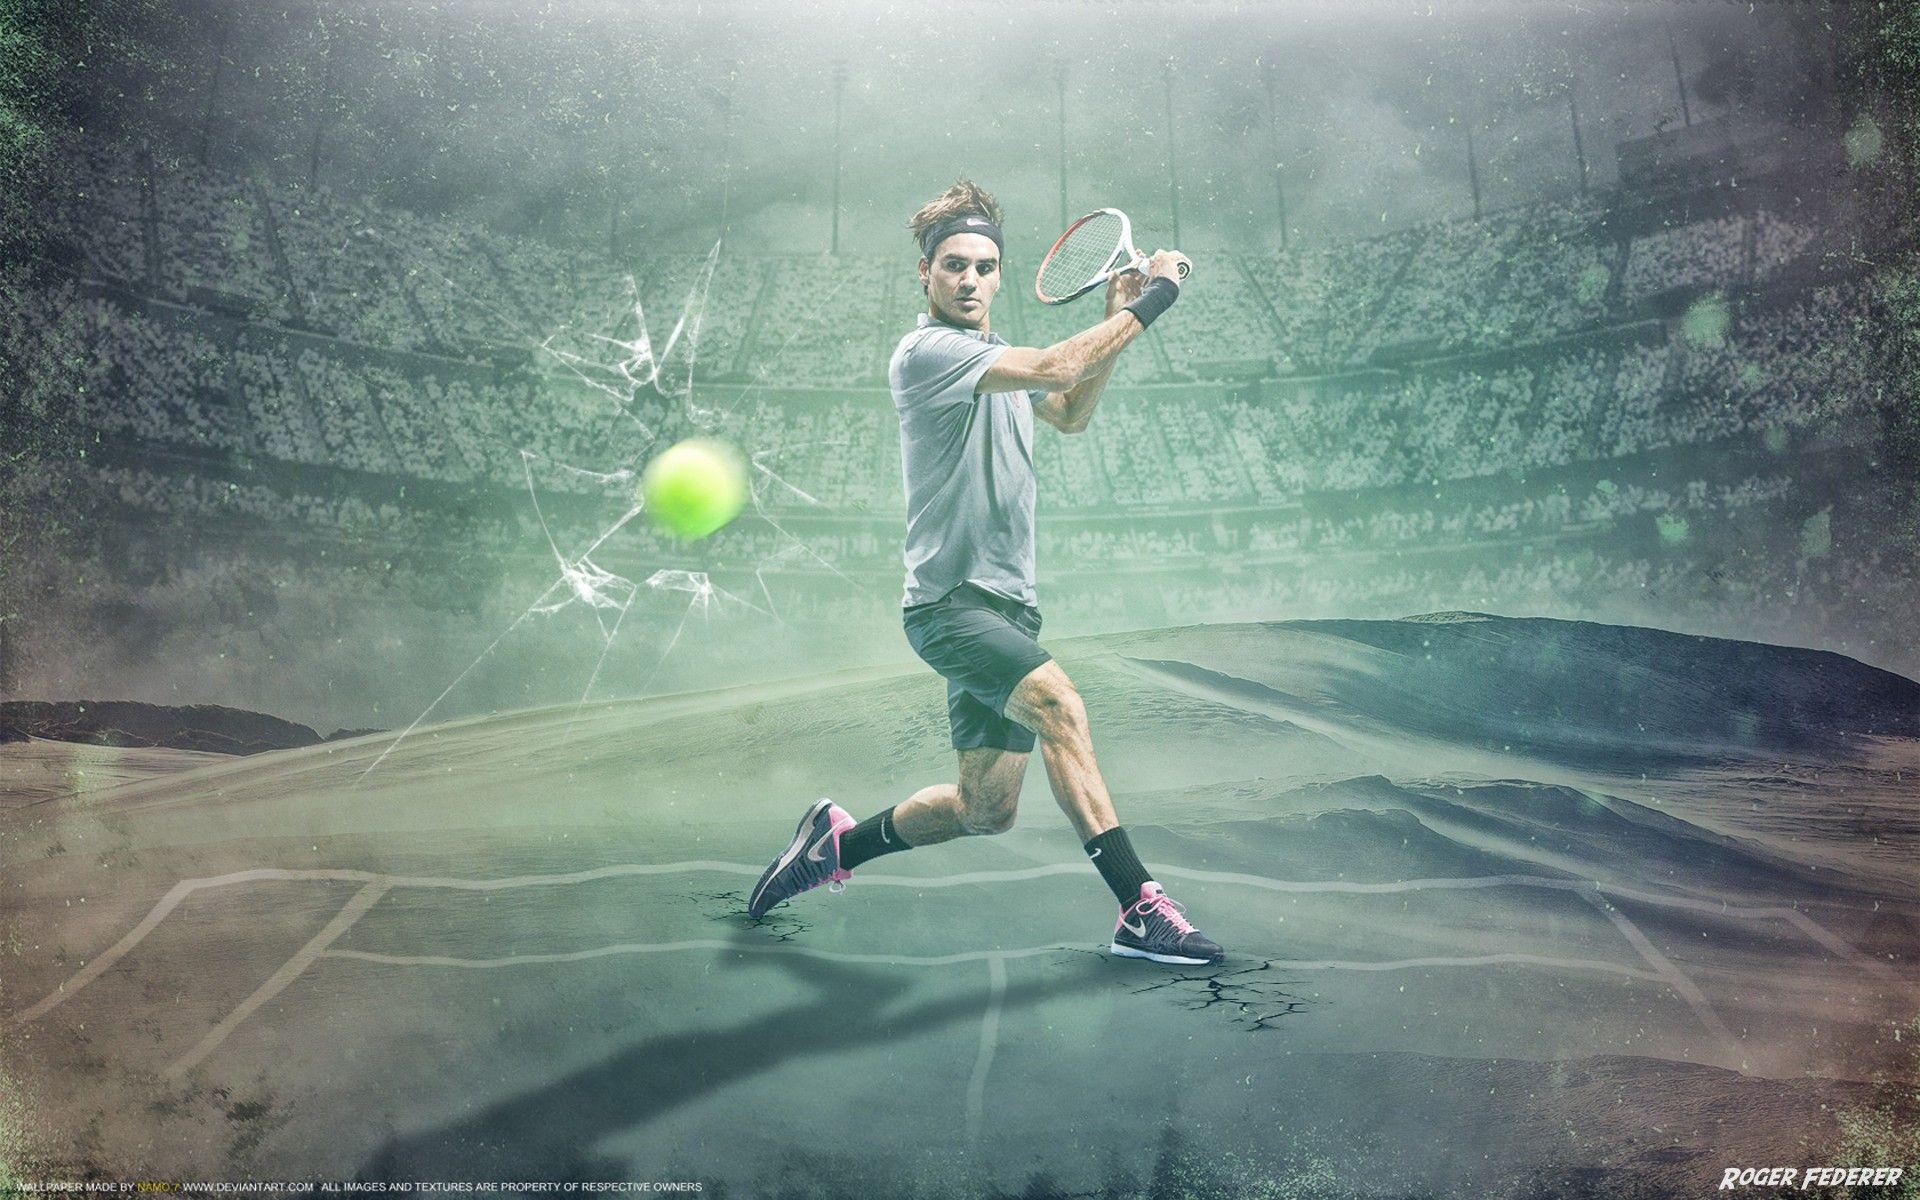 Roger Federer Tennis Player Stylish Image Wallpaper Best HD